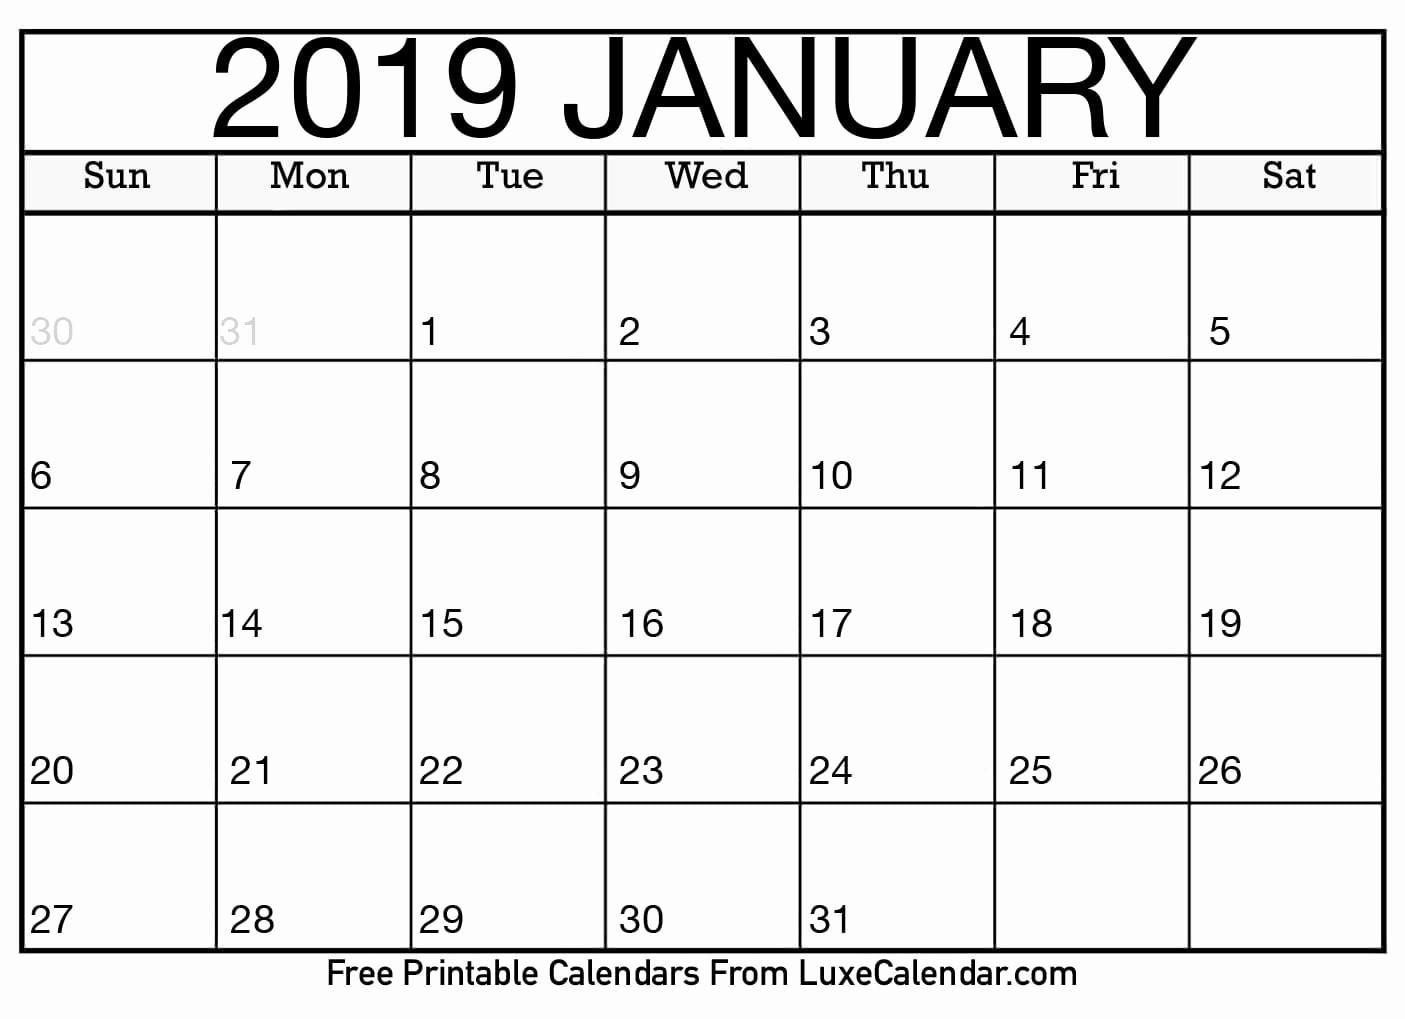 Blank January 2019 Calendar Template Fresh Blank January 2019 Printable Calendar Luxe Calendar